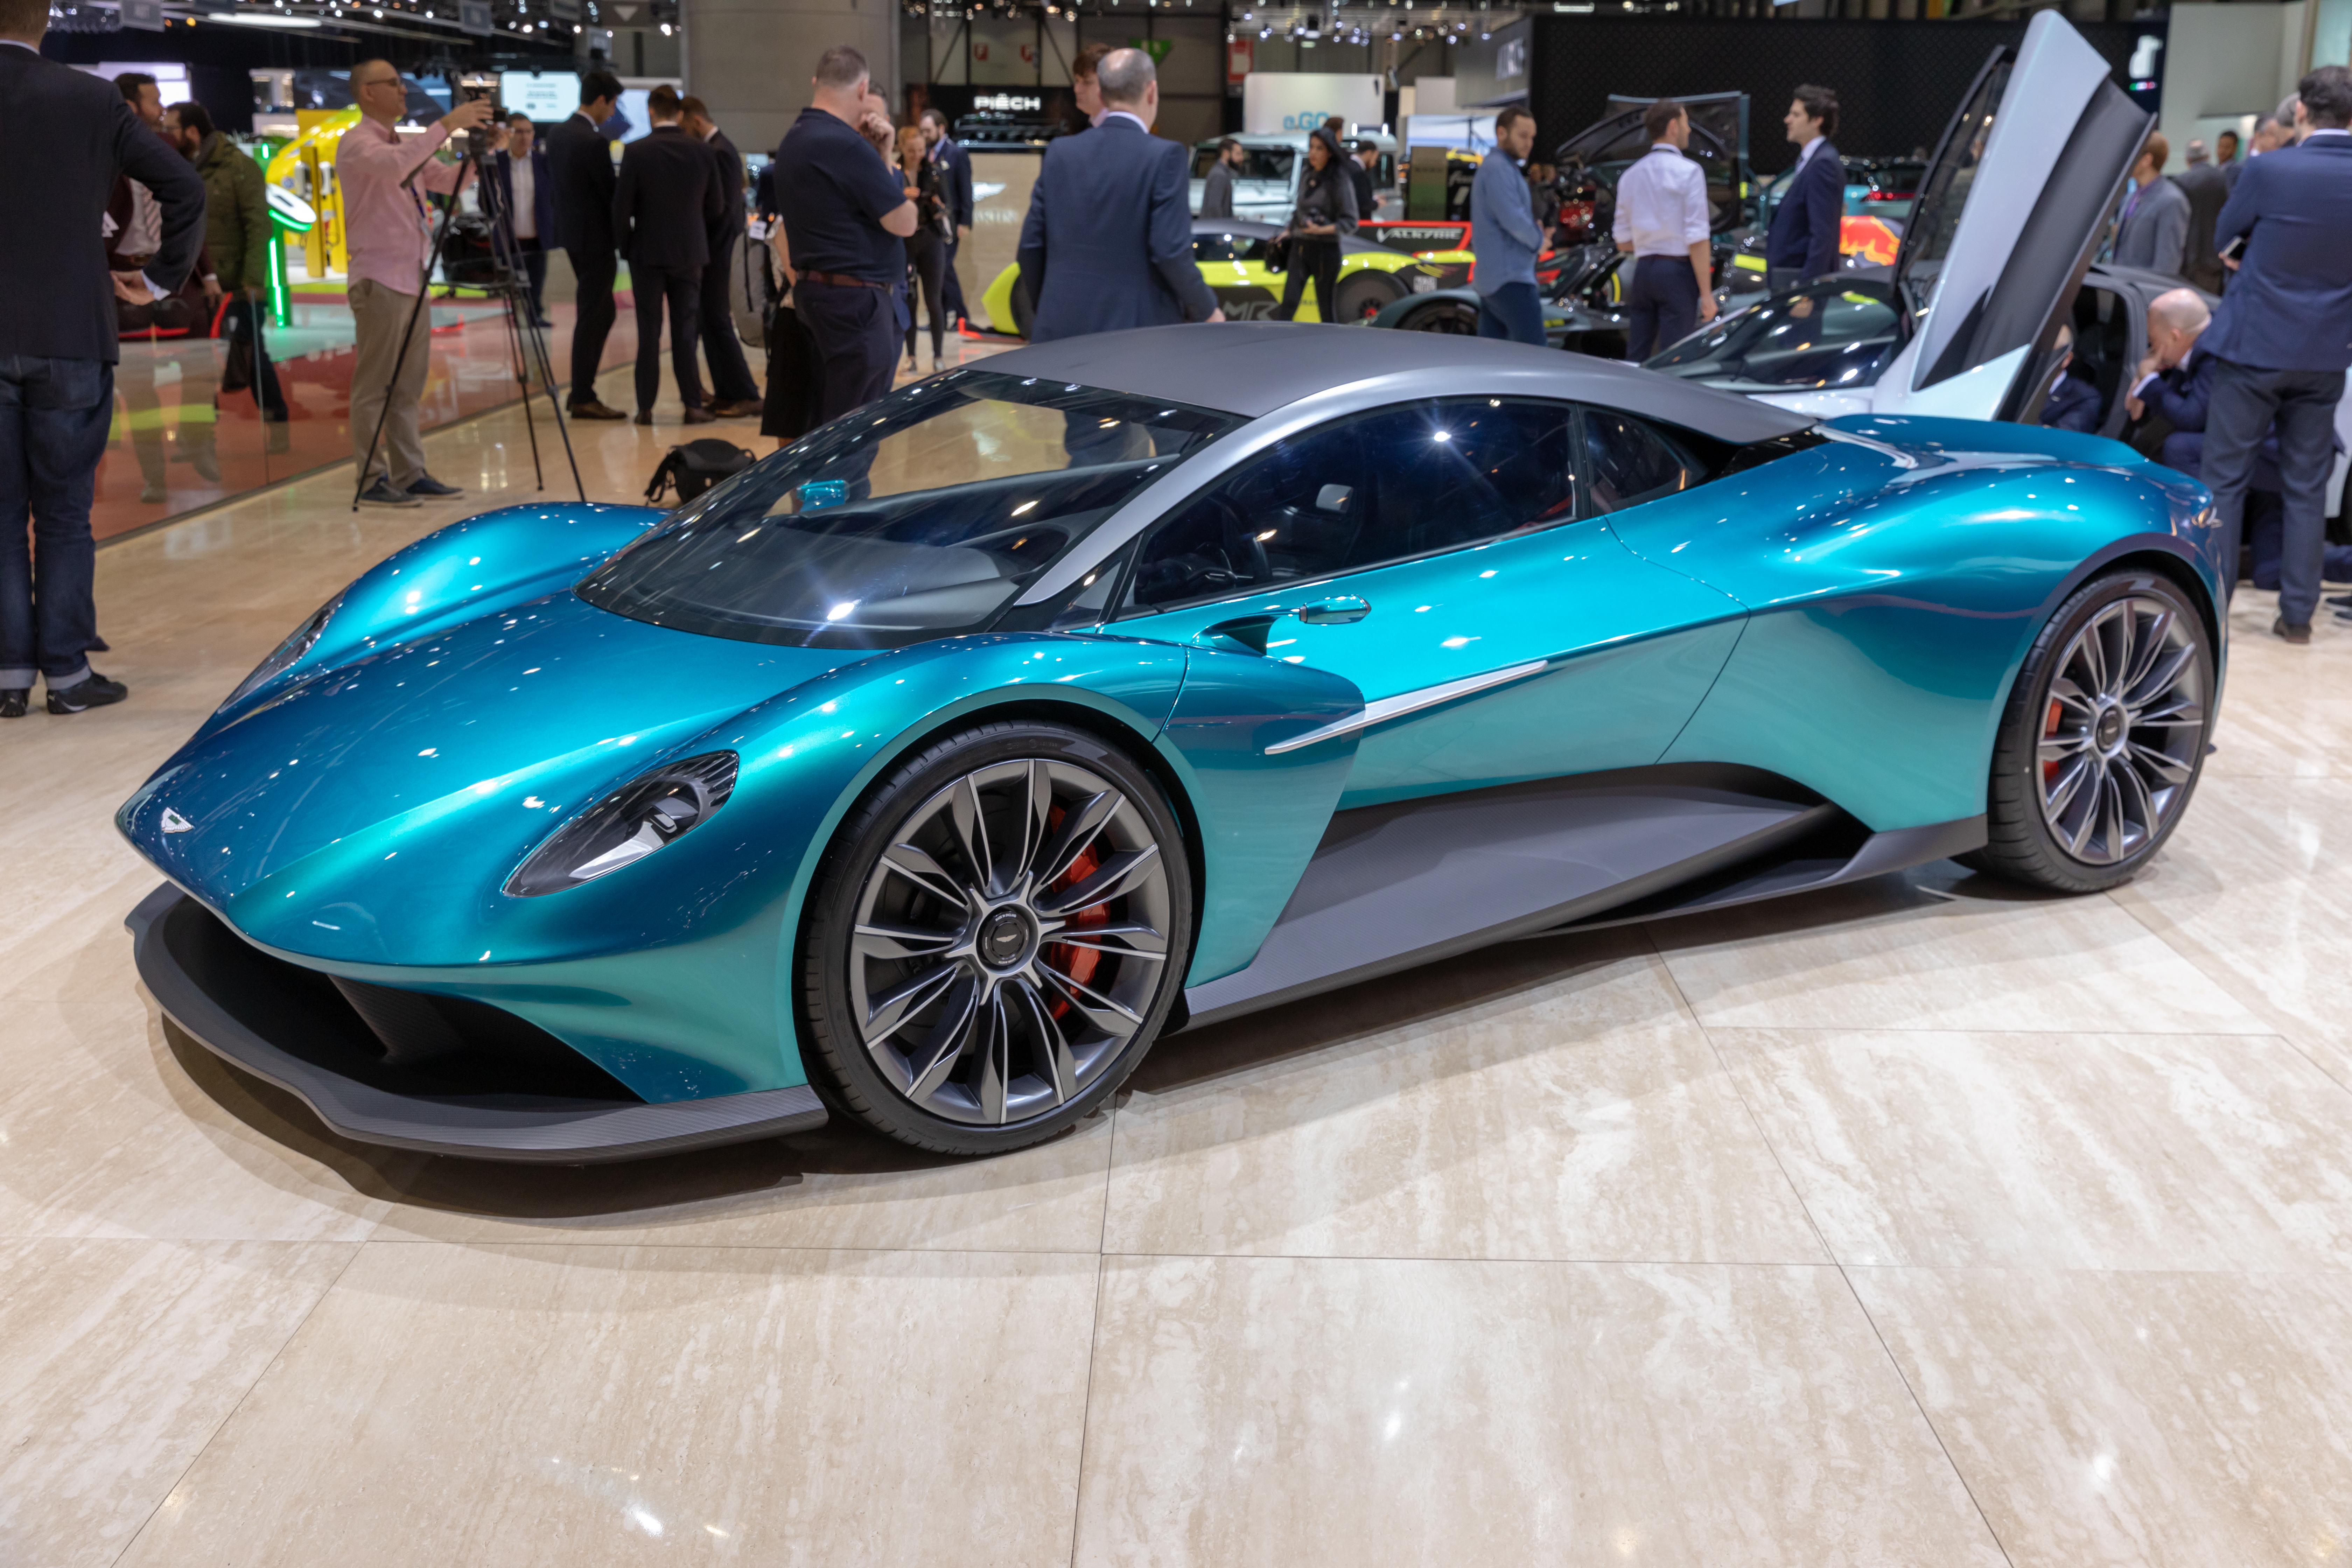 File Aston Martin Vanquish Vision Concept Gims 2019 Le Grand Saconnex Gims1087 Jpg Wikimedia Commons